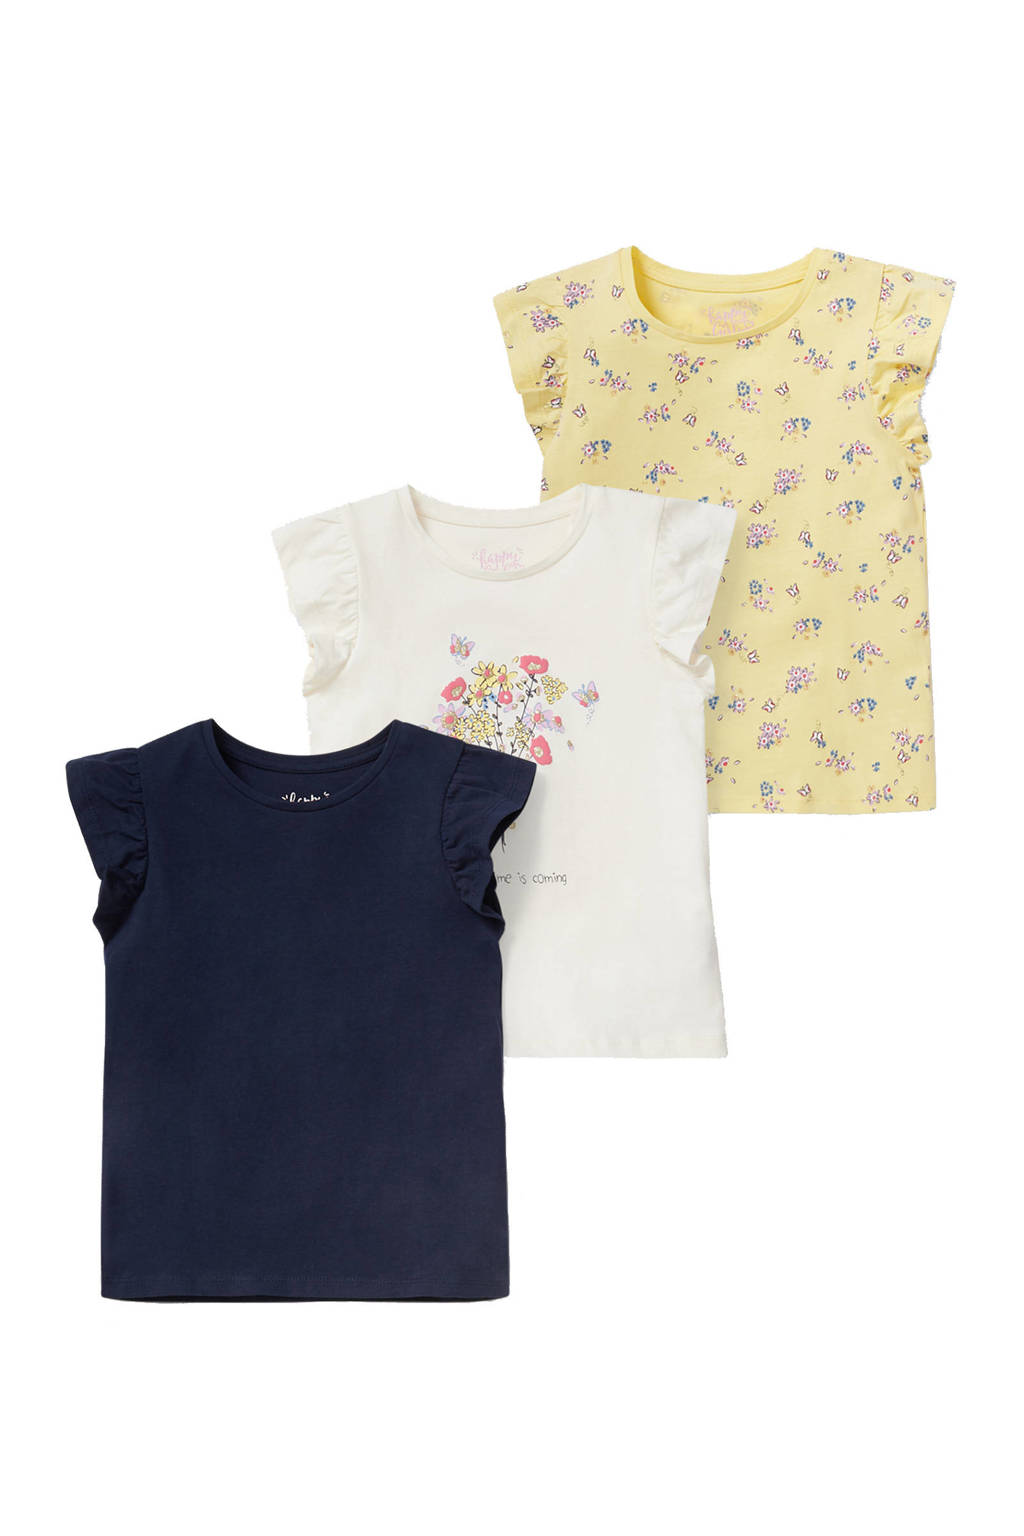 C&A Happy girls Club T-shirt - set van 3 wit/donkerblauw/geel, Geel/donkerblauw/wit